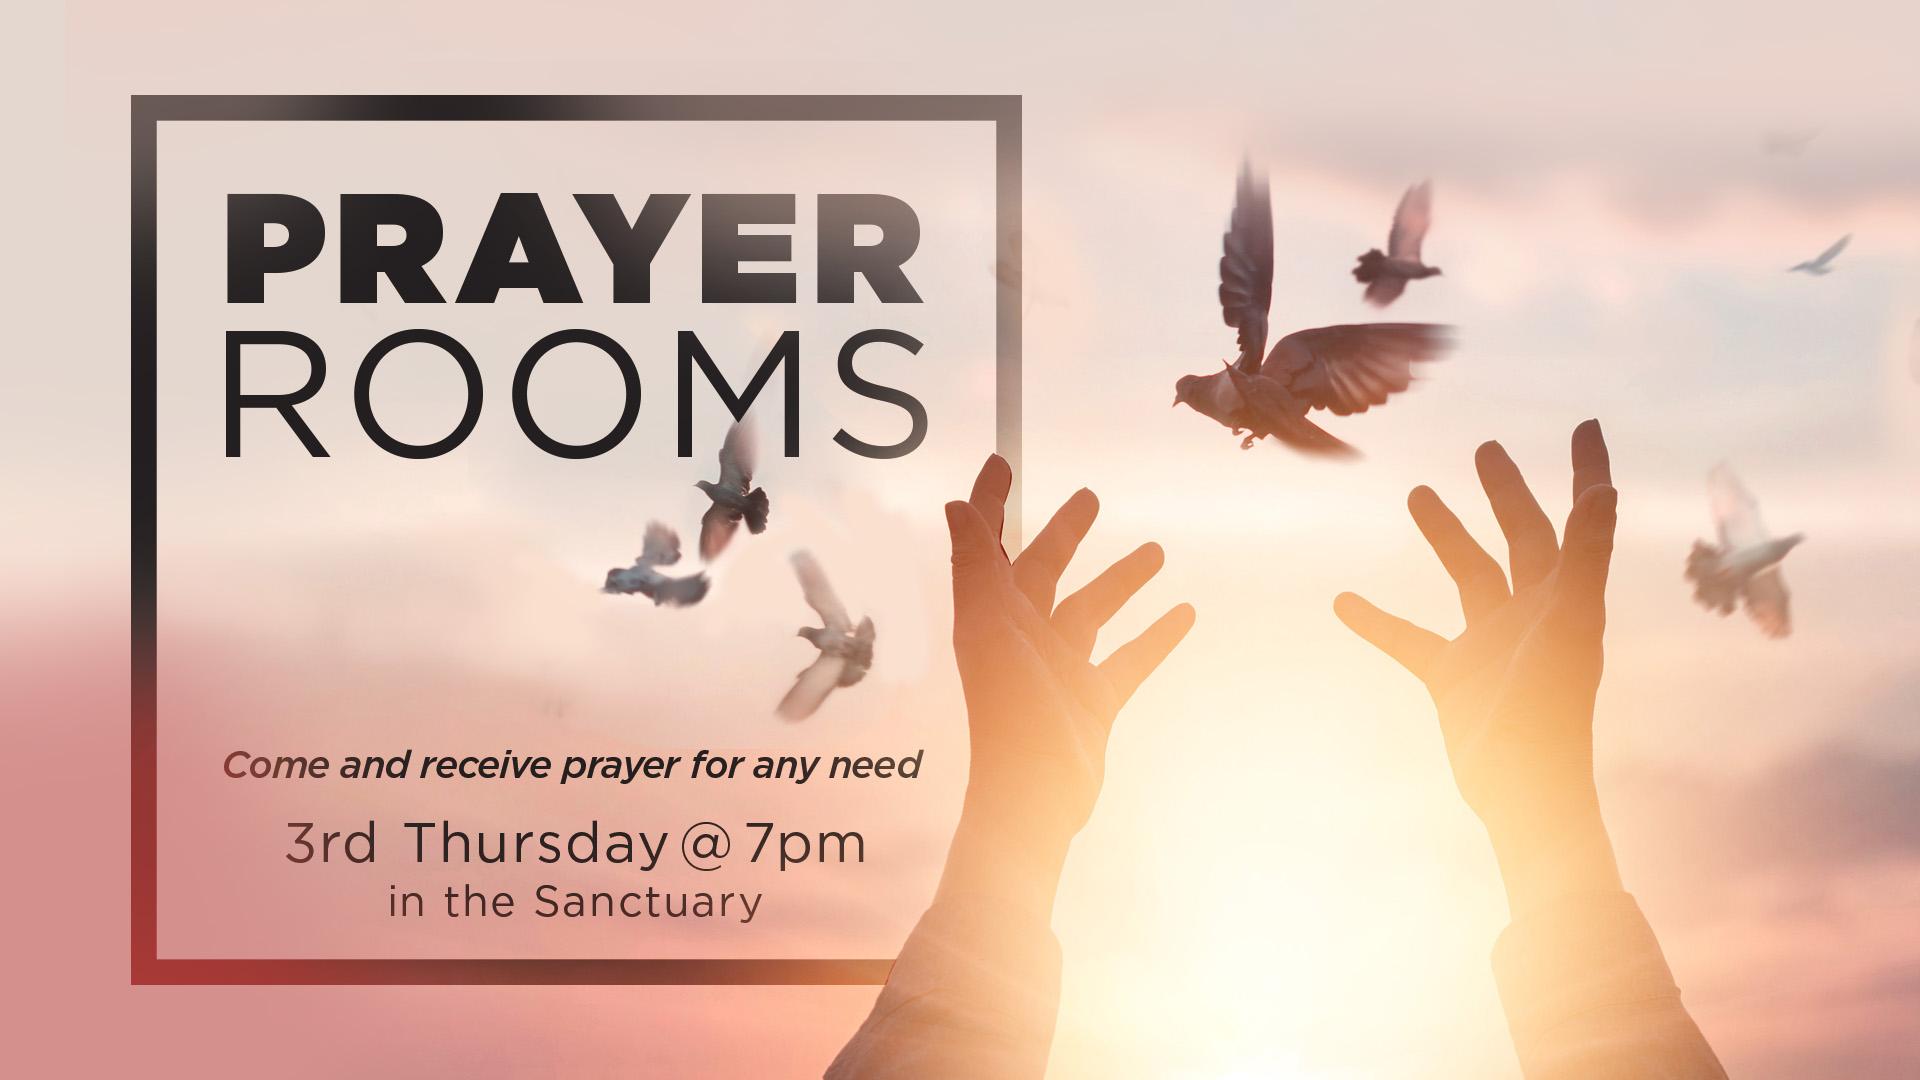 PrayerRooms_1920x1080.jpg